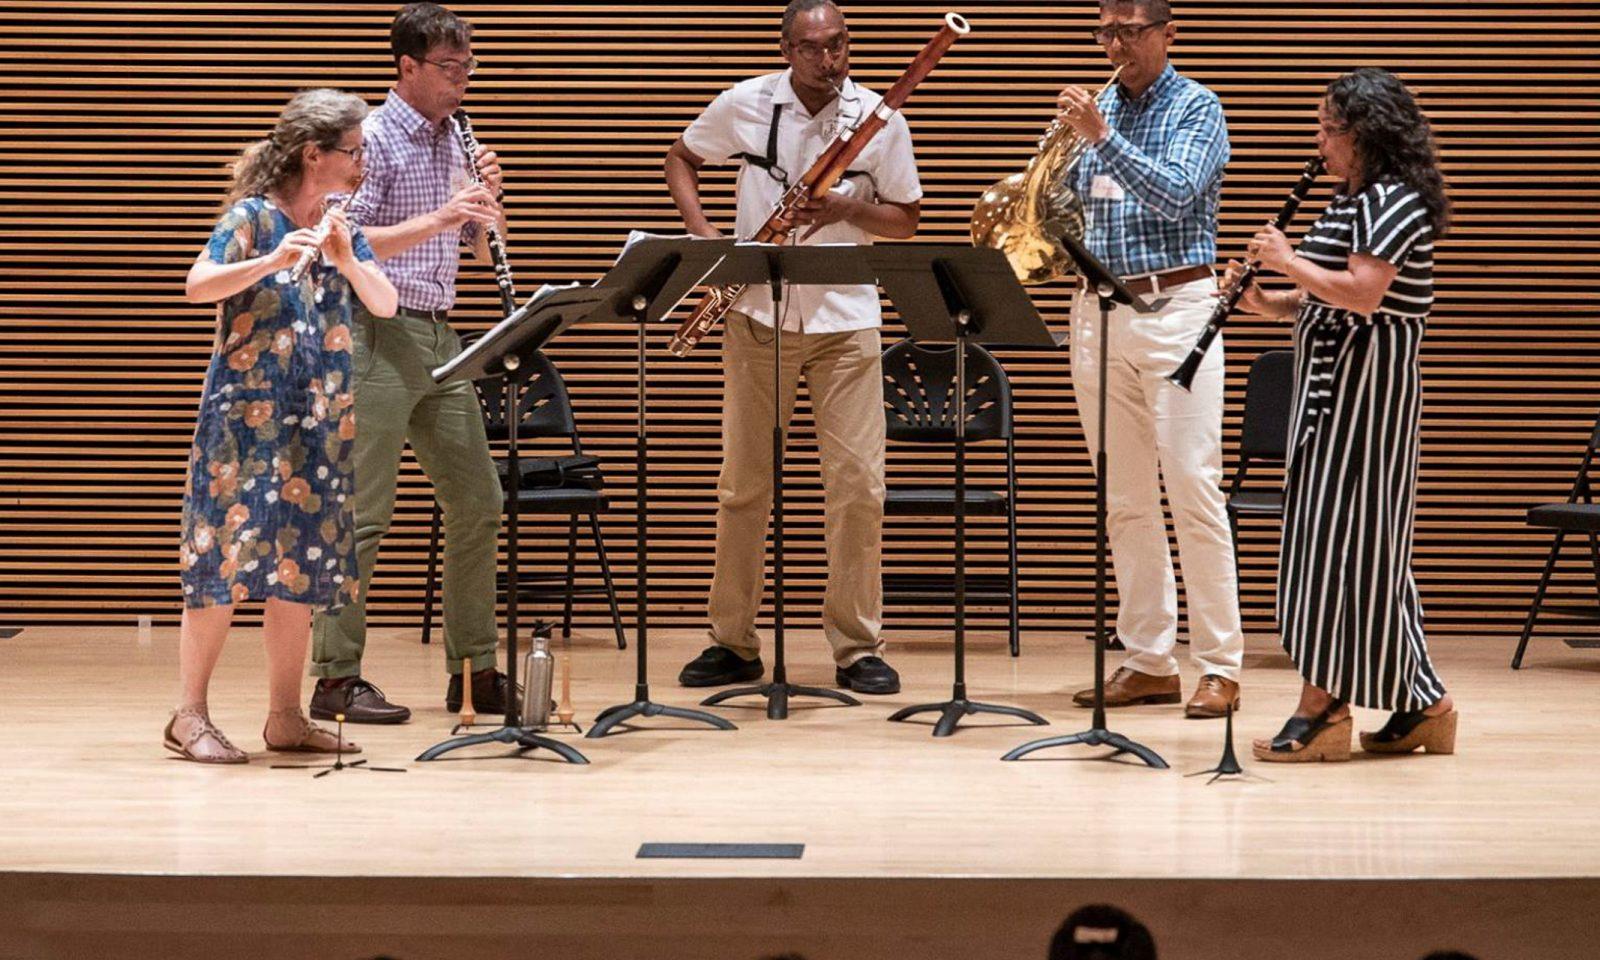 Quinteto Latino, 2017 NALAC Fund for the Arts Grantee